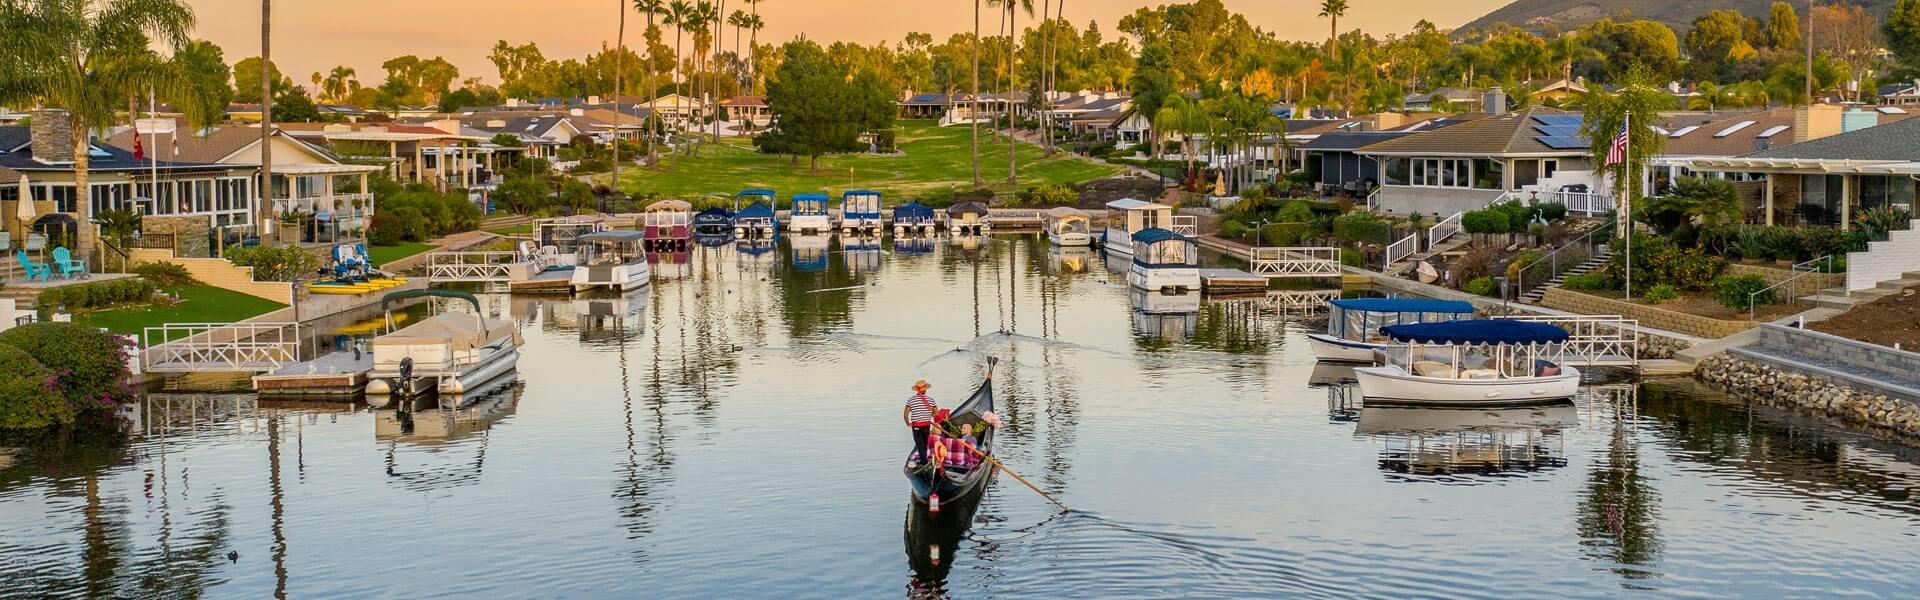 Gondola Rides in San Diego